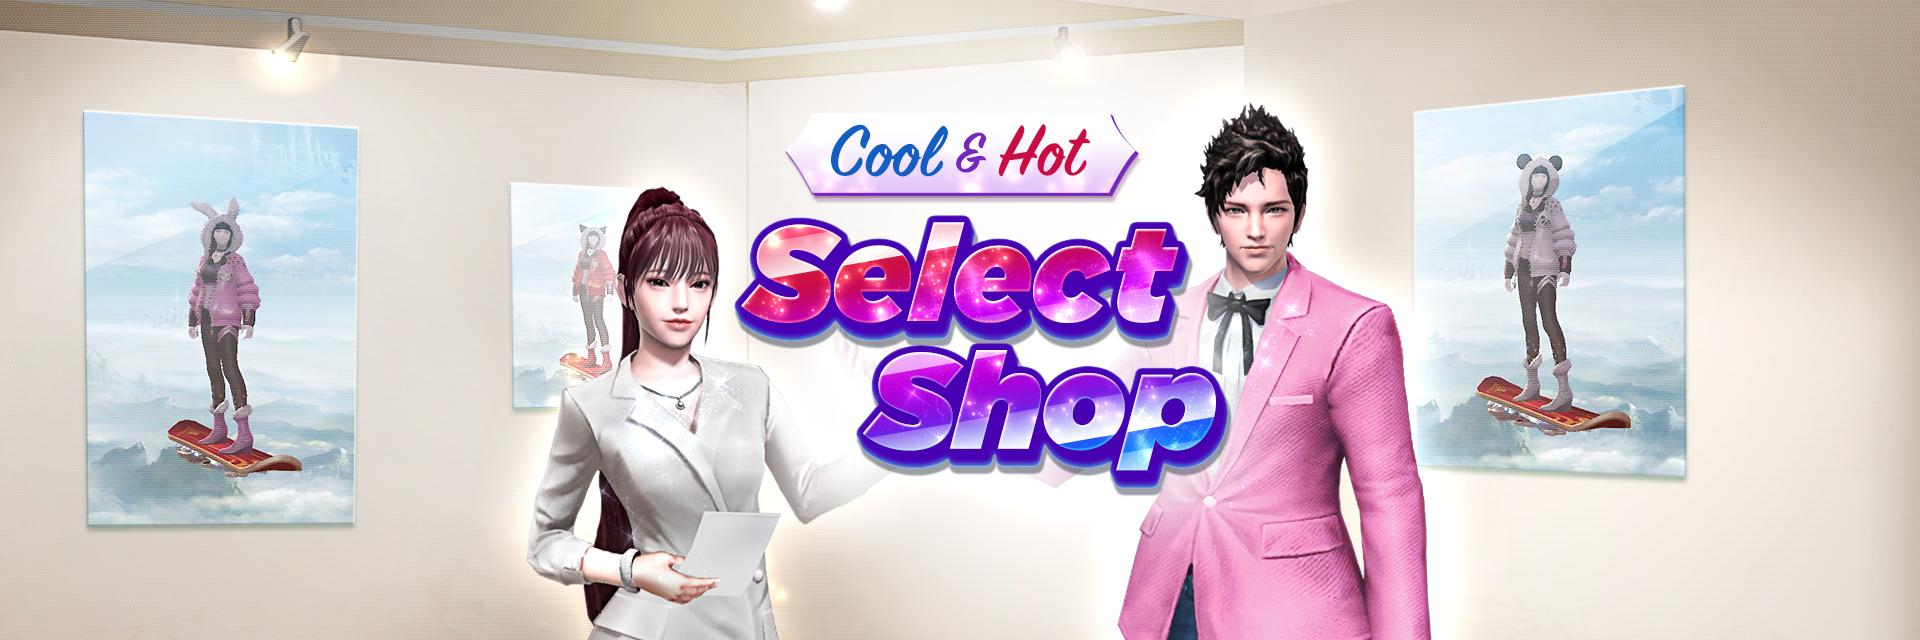 COOl & HOT SELECT SH